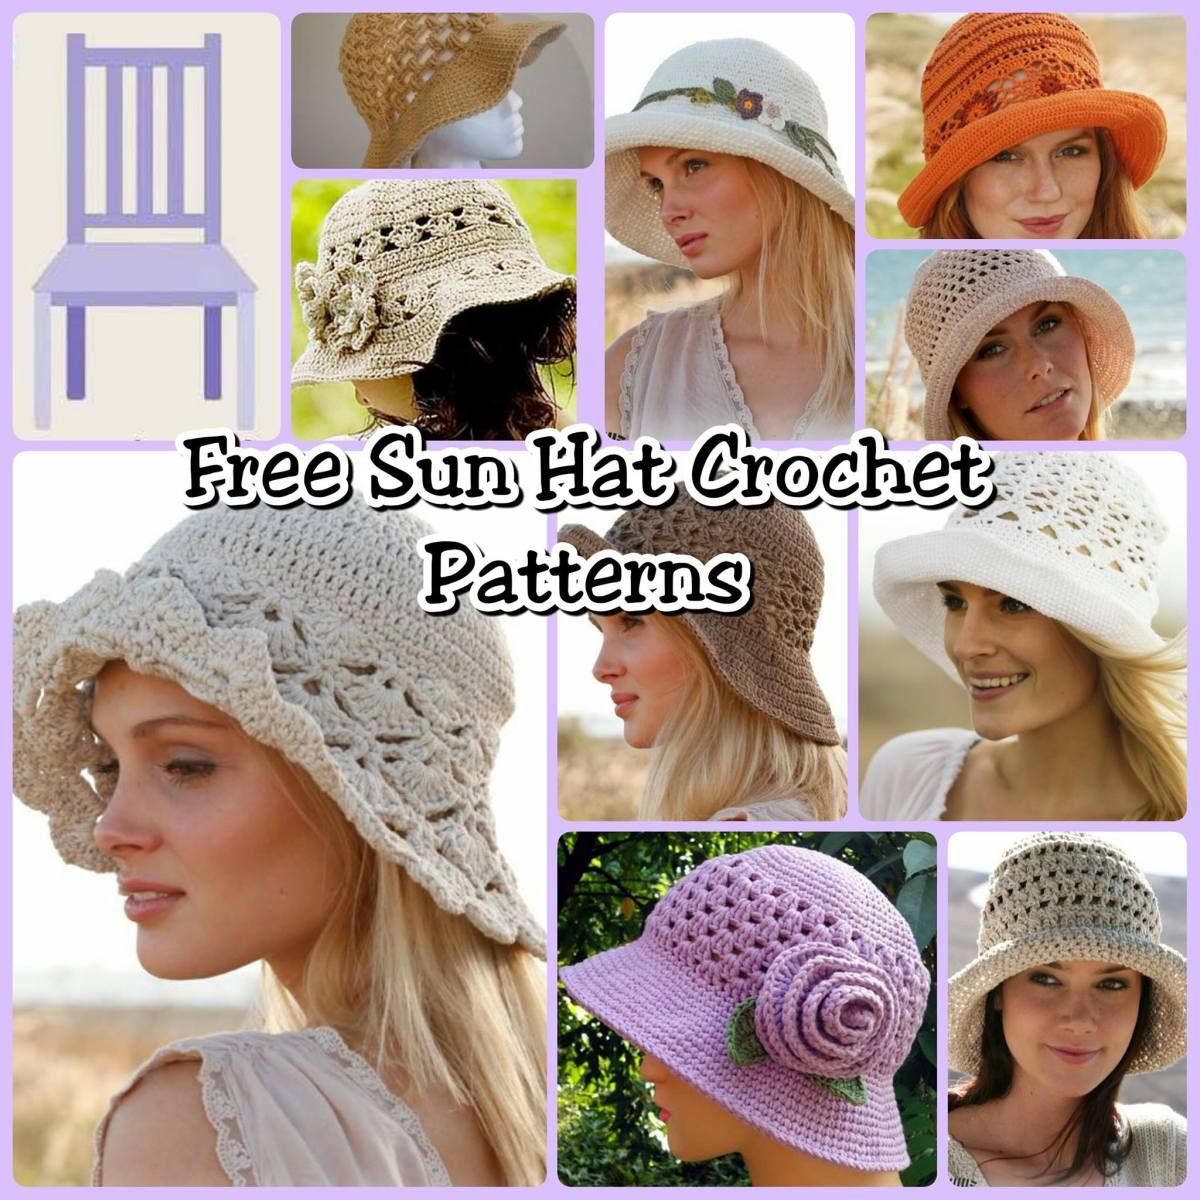 Free Sun Hat Crochet Patterns Crochetknitquilting Crochet Hats